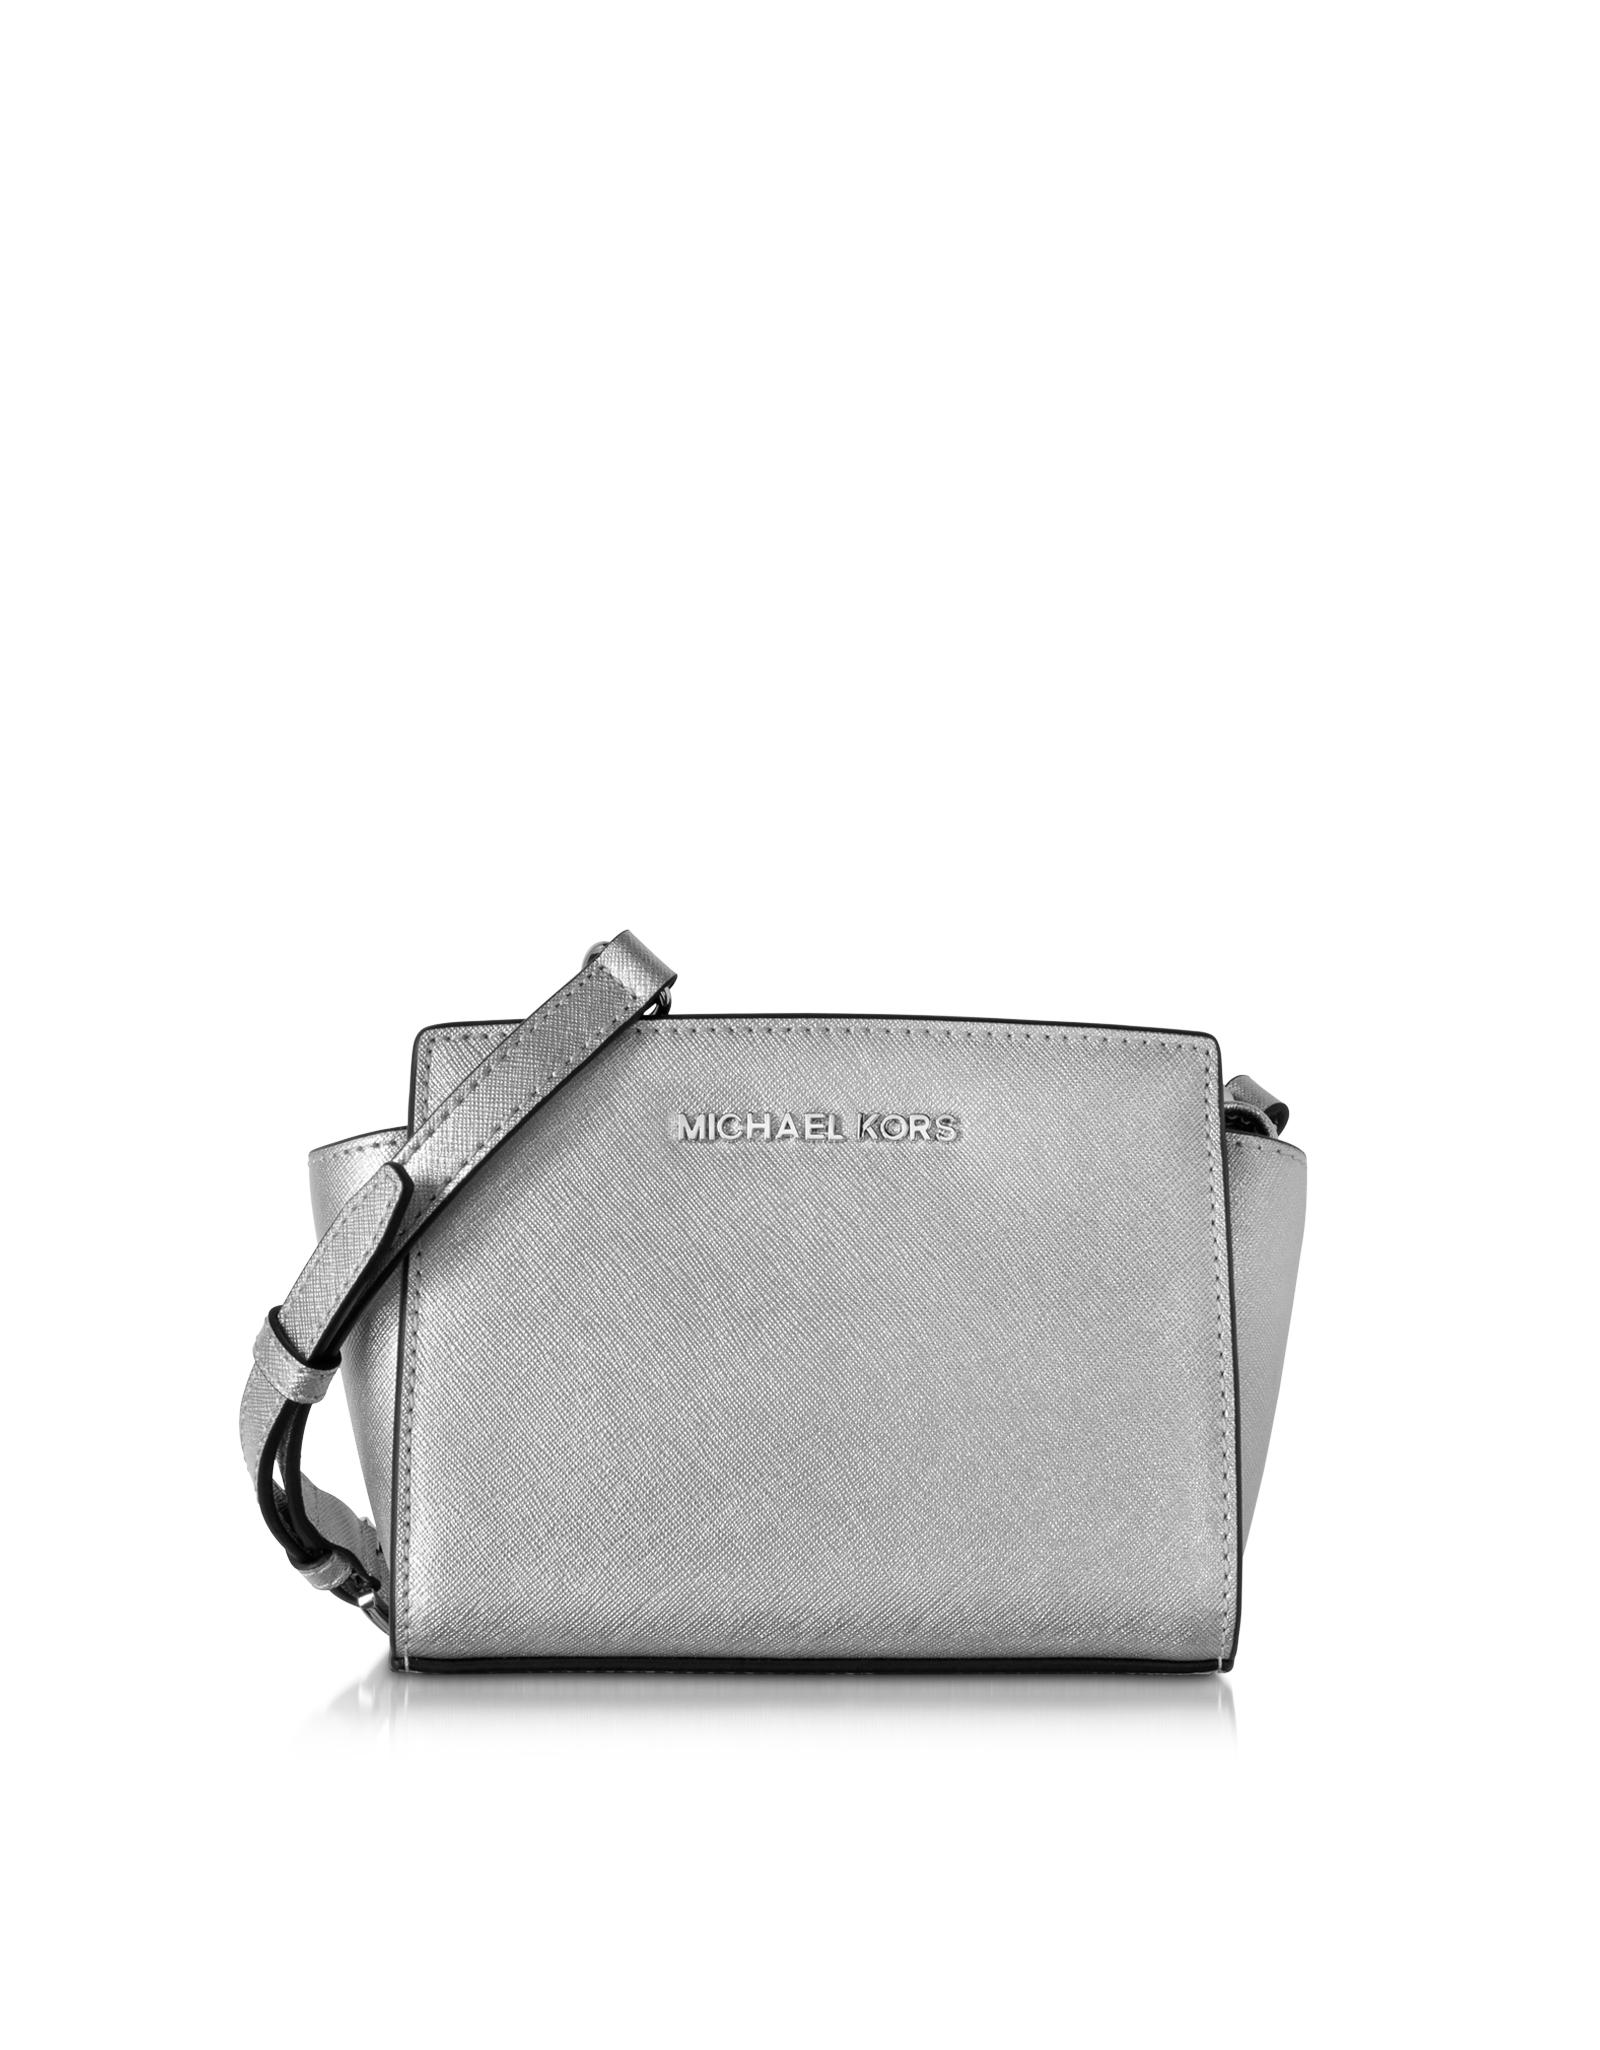 b4f991ded930 Lyst - Michael Kors Selma Silver Saffiano Leather Mini Messenger in ...